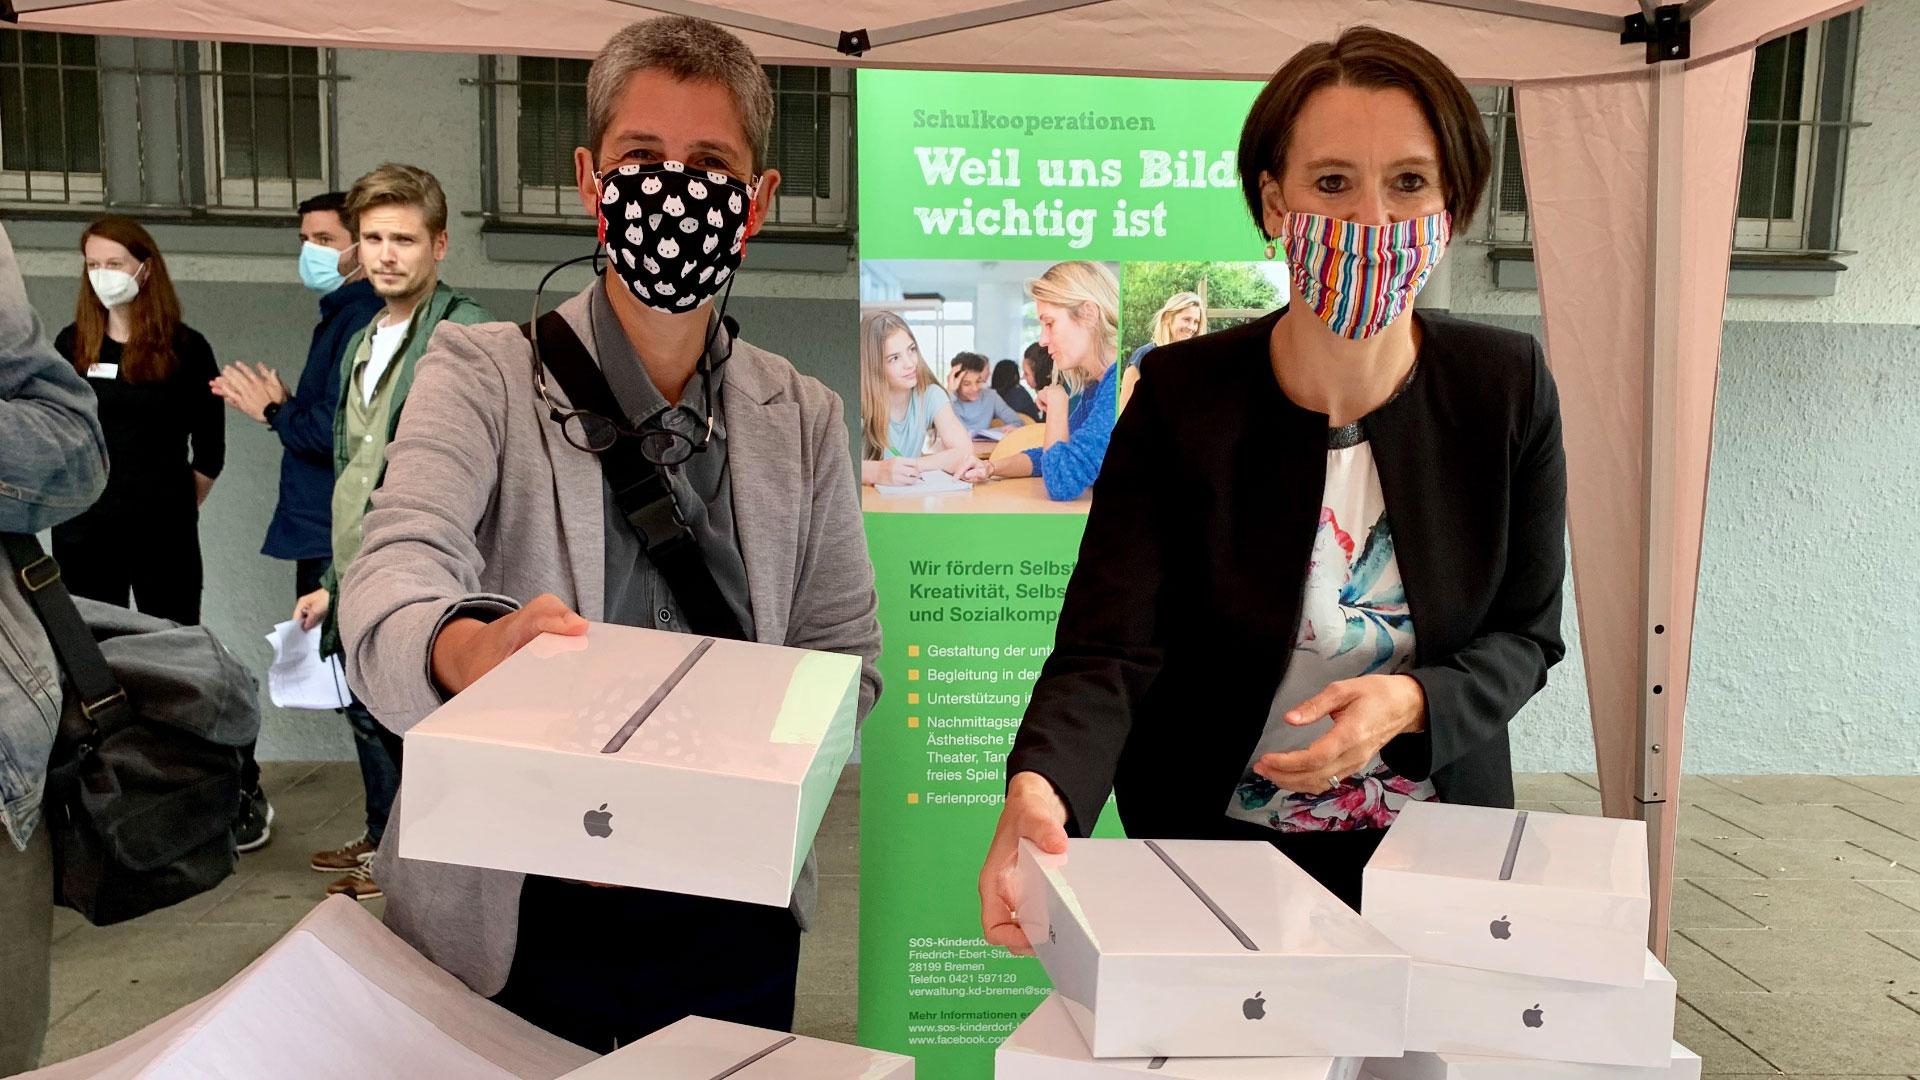 Bremen verteilt 100.000 iPads an Schüler und Lehrer